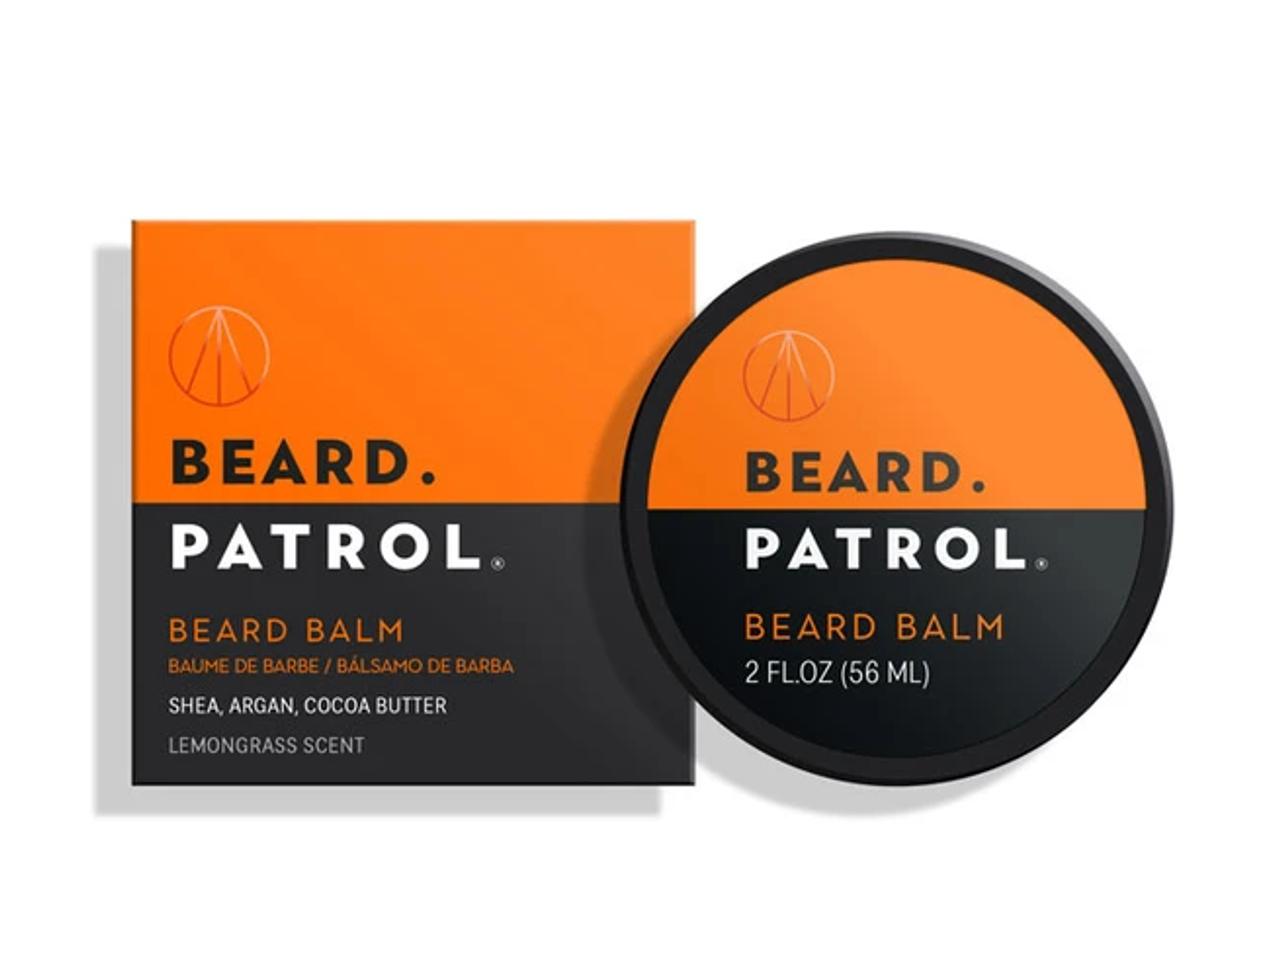 Beard Patrol Balm